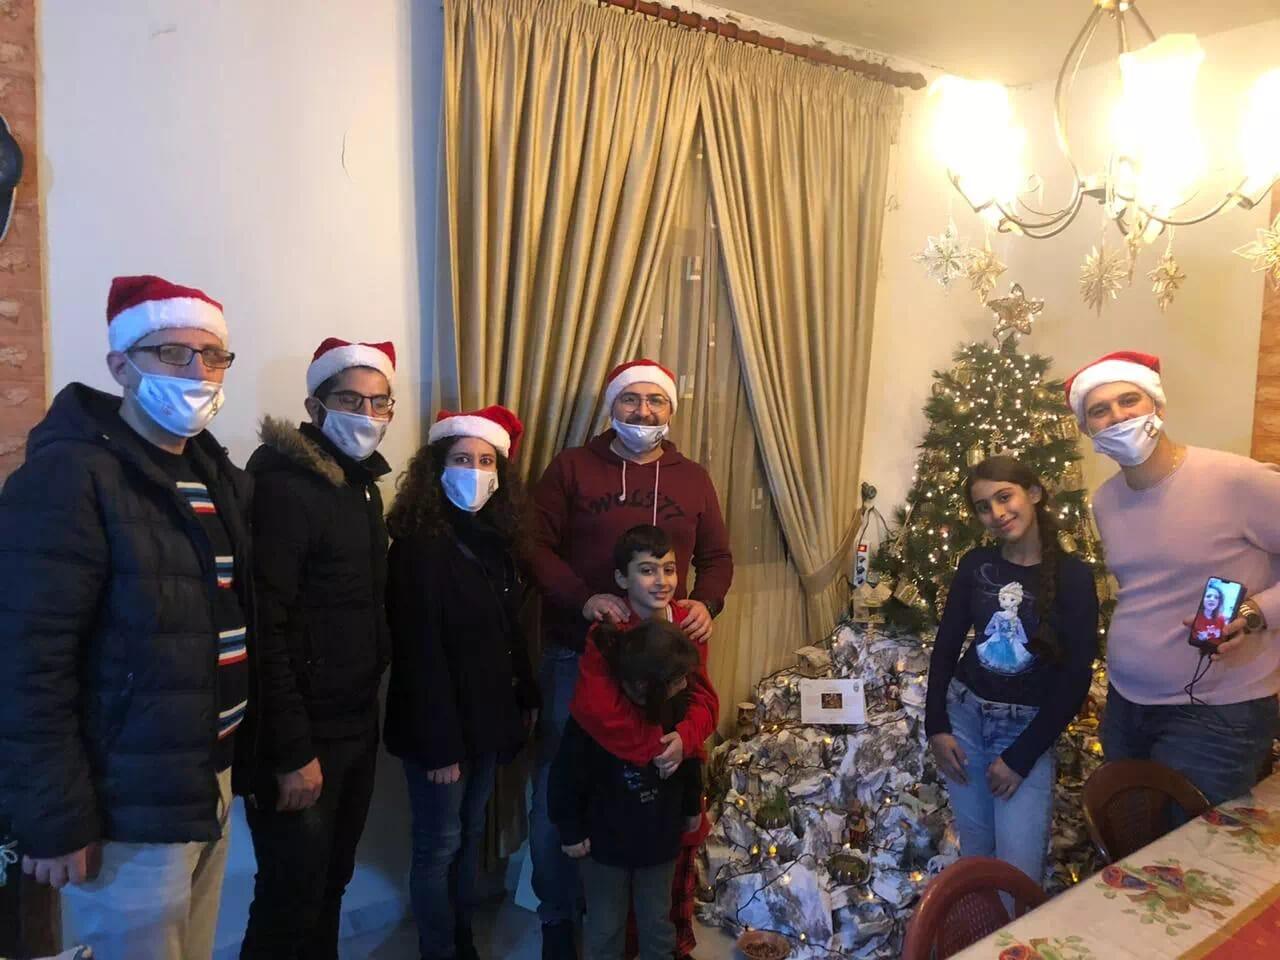 https://eundemia.sirv.com/Images/christmas/456918.webp